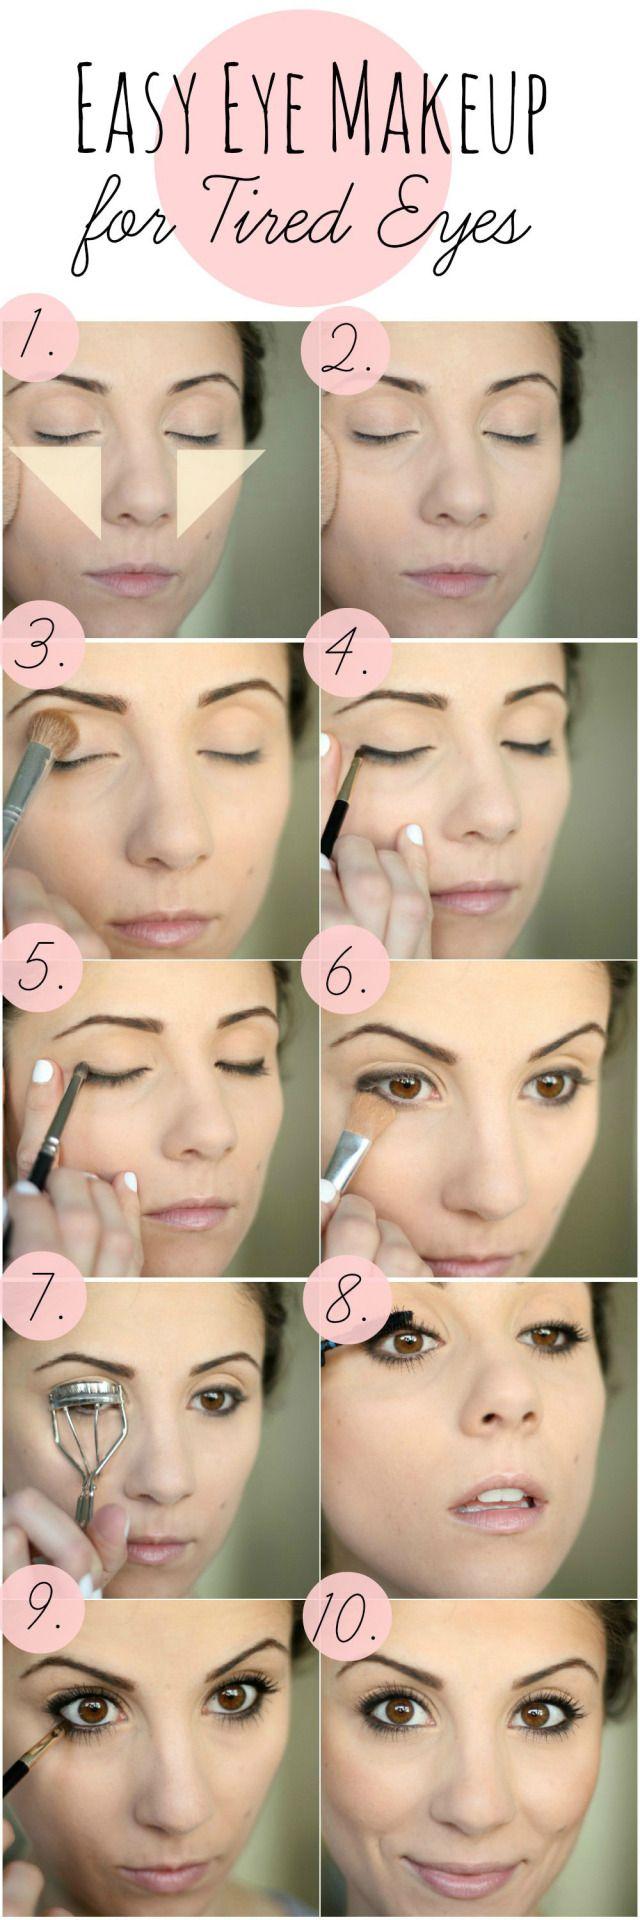 Easy Eye Makeup Tutorial For Tired Eyes